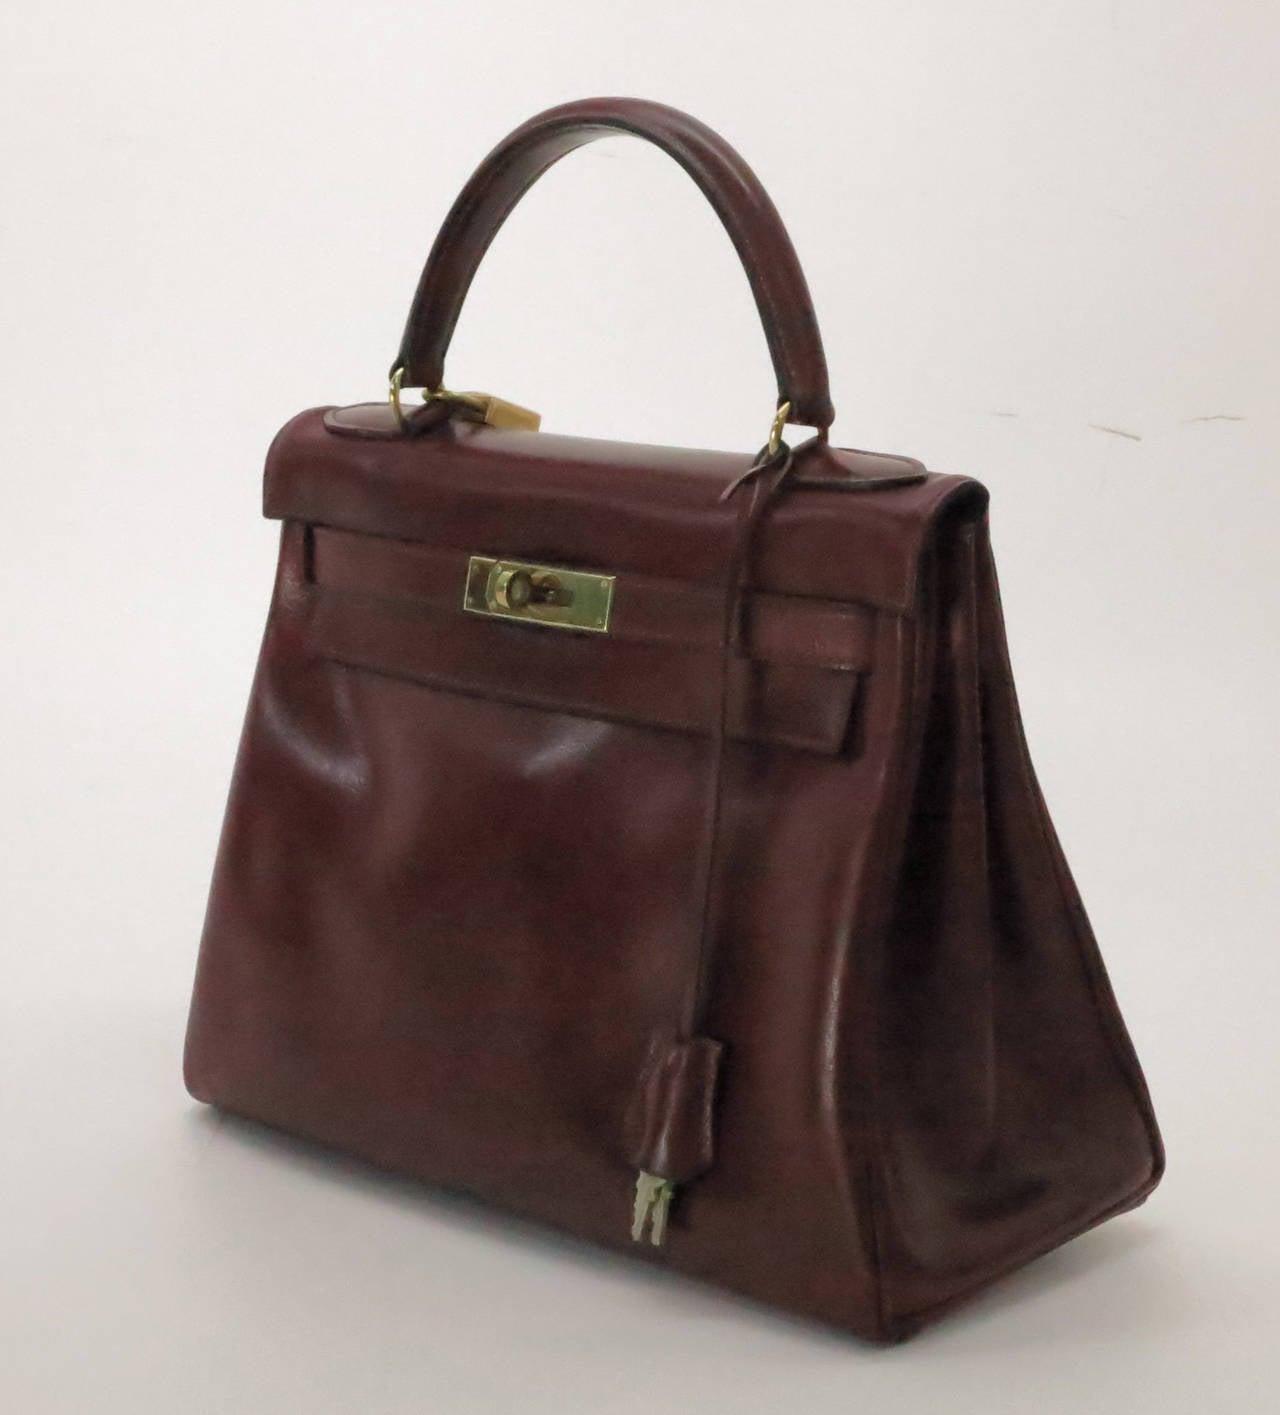 d1f268c6b1bd Hermes Kelly handbag...Beautiful rich burgundy box calf Kelly handbag dated  P-